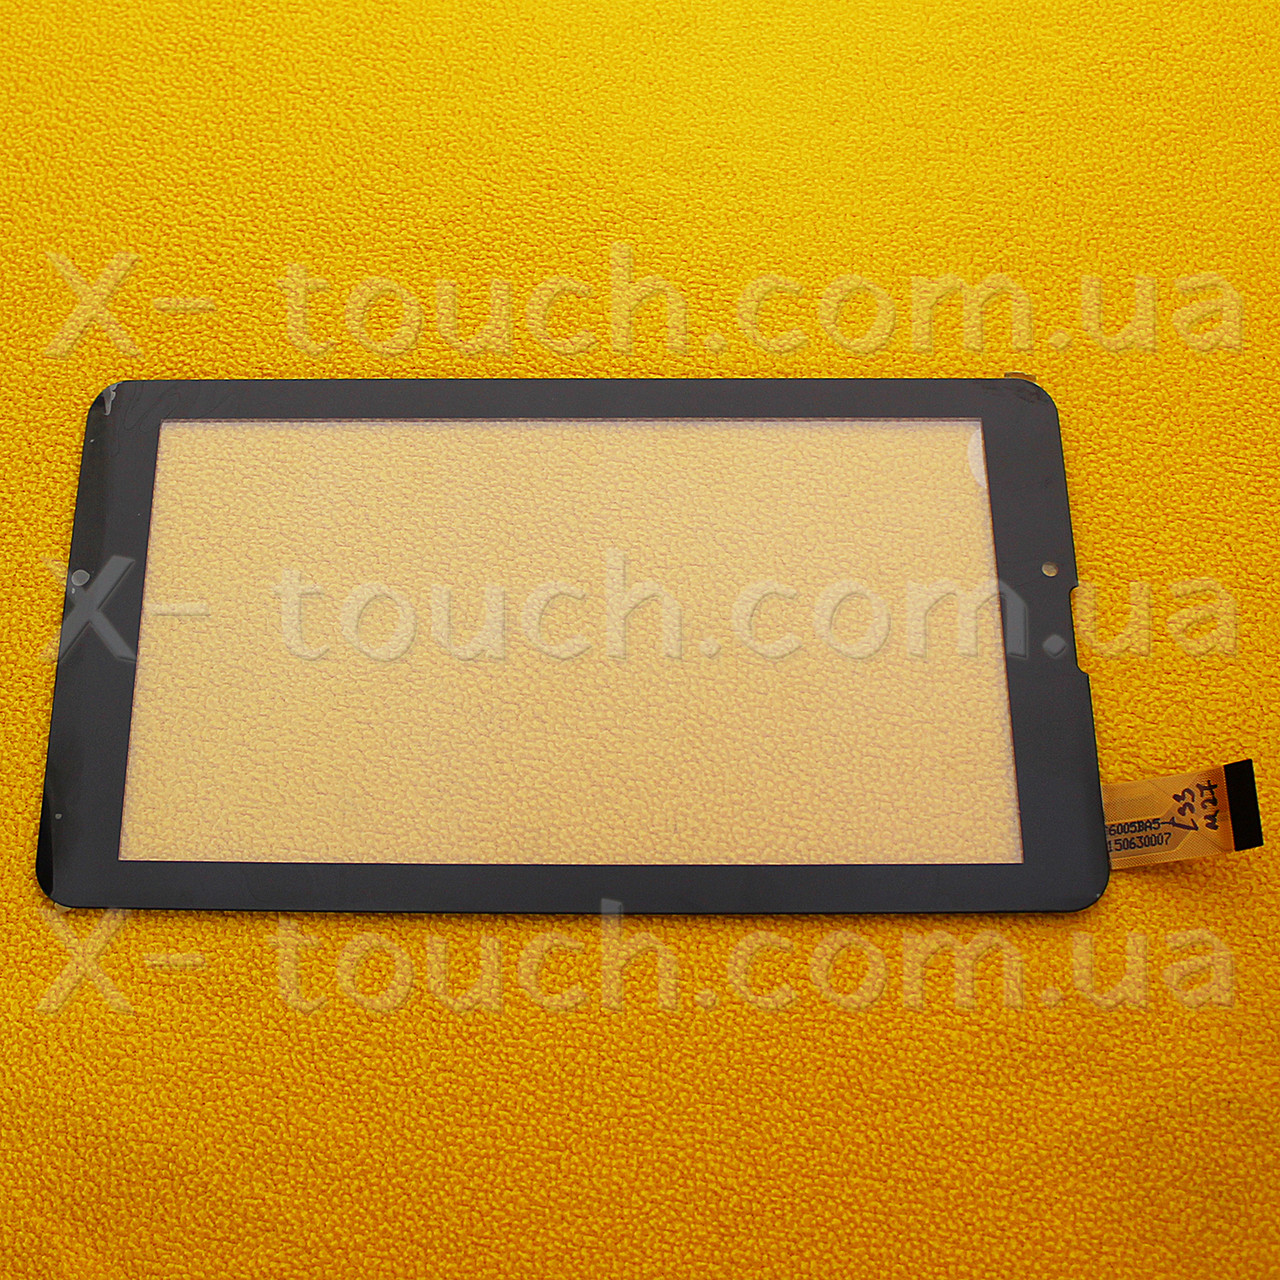 Digma Plane 7.12 3G (PS7012PG) cенсор, тачскрин 7,0 дюймов, цвет